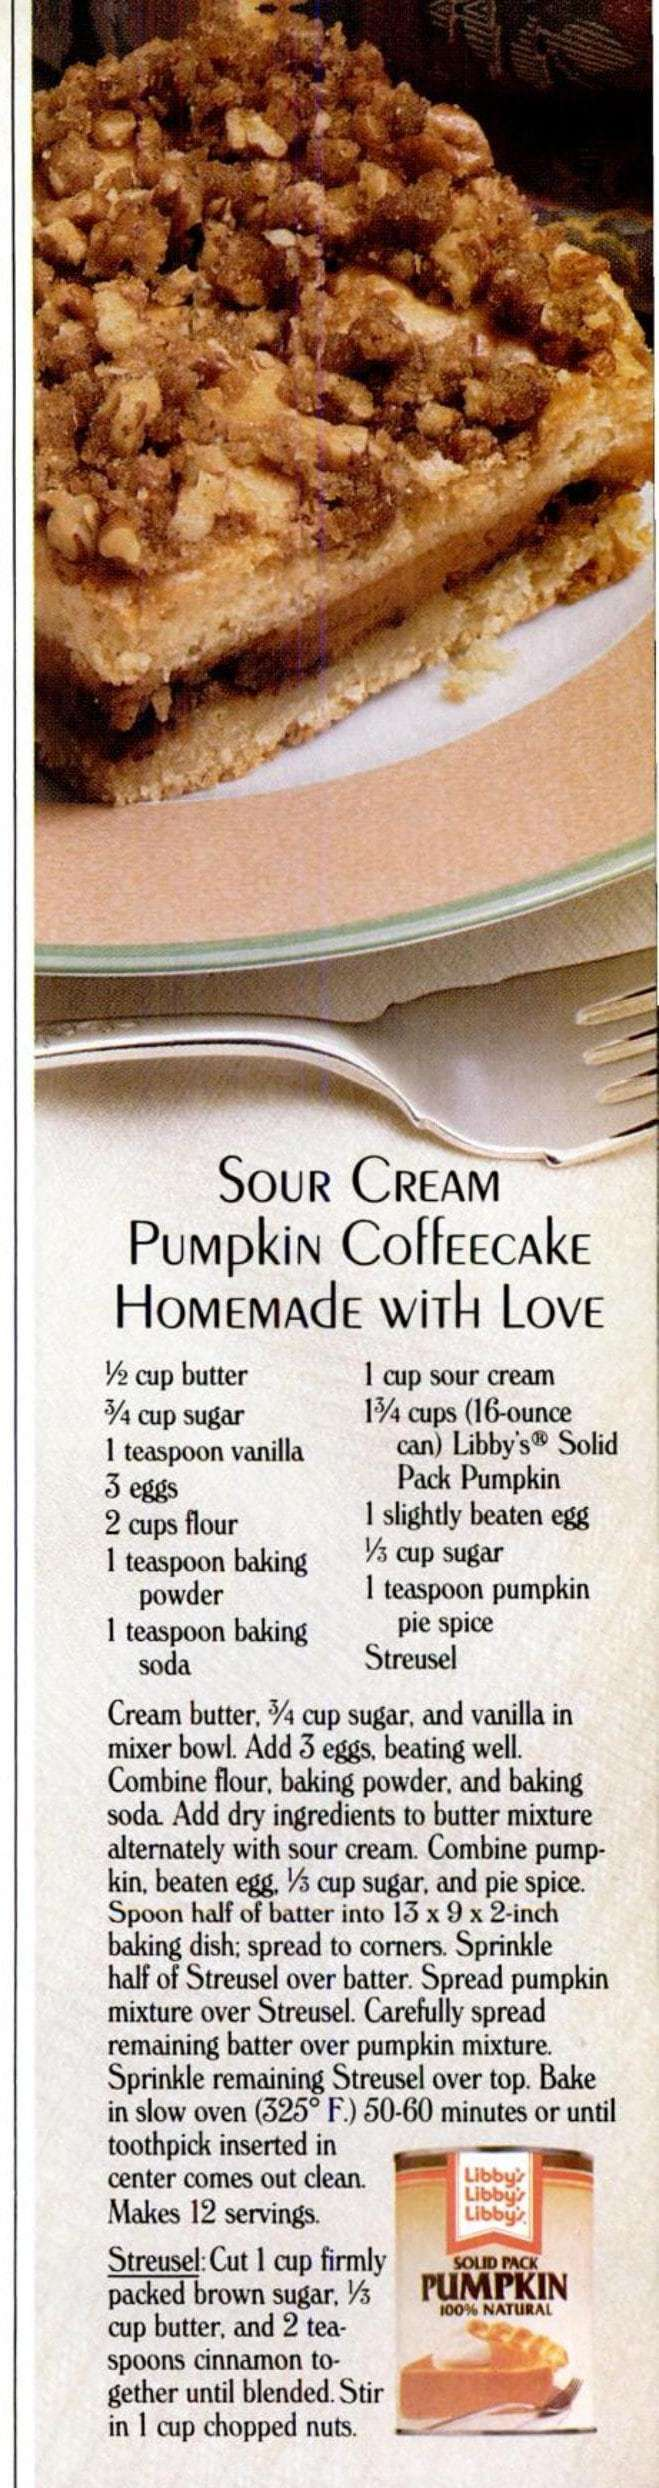 Sour Cream Pumpkin Coffee Cake Pumpkin Streusel Swirl Coffee Cake Retro Recipes Click Americana